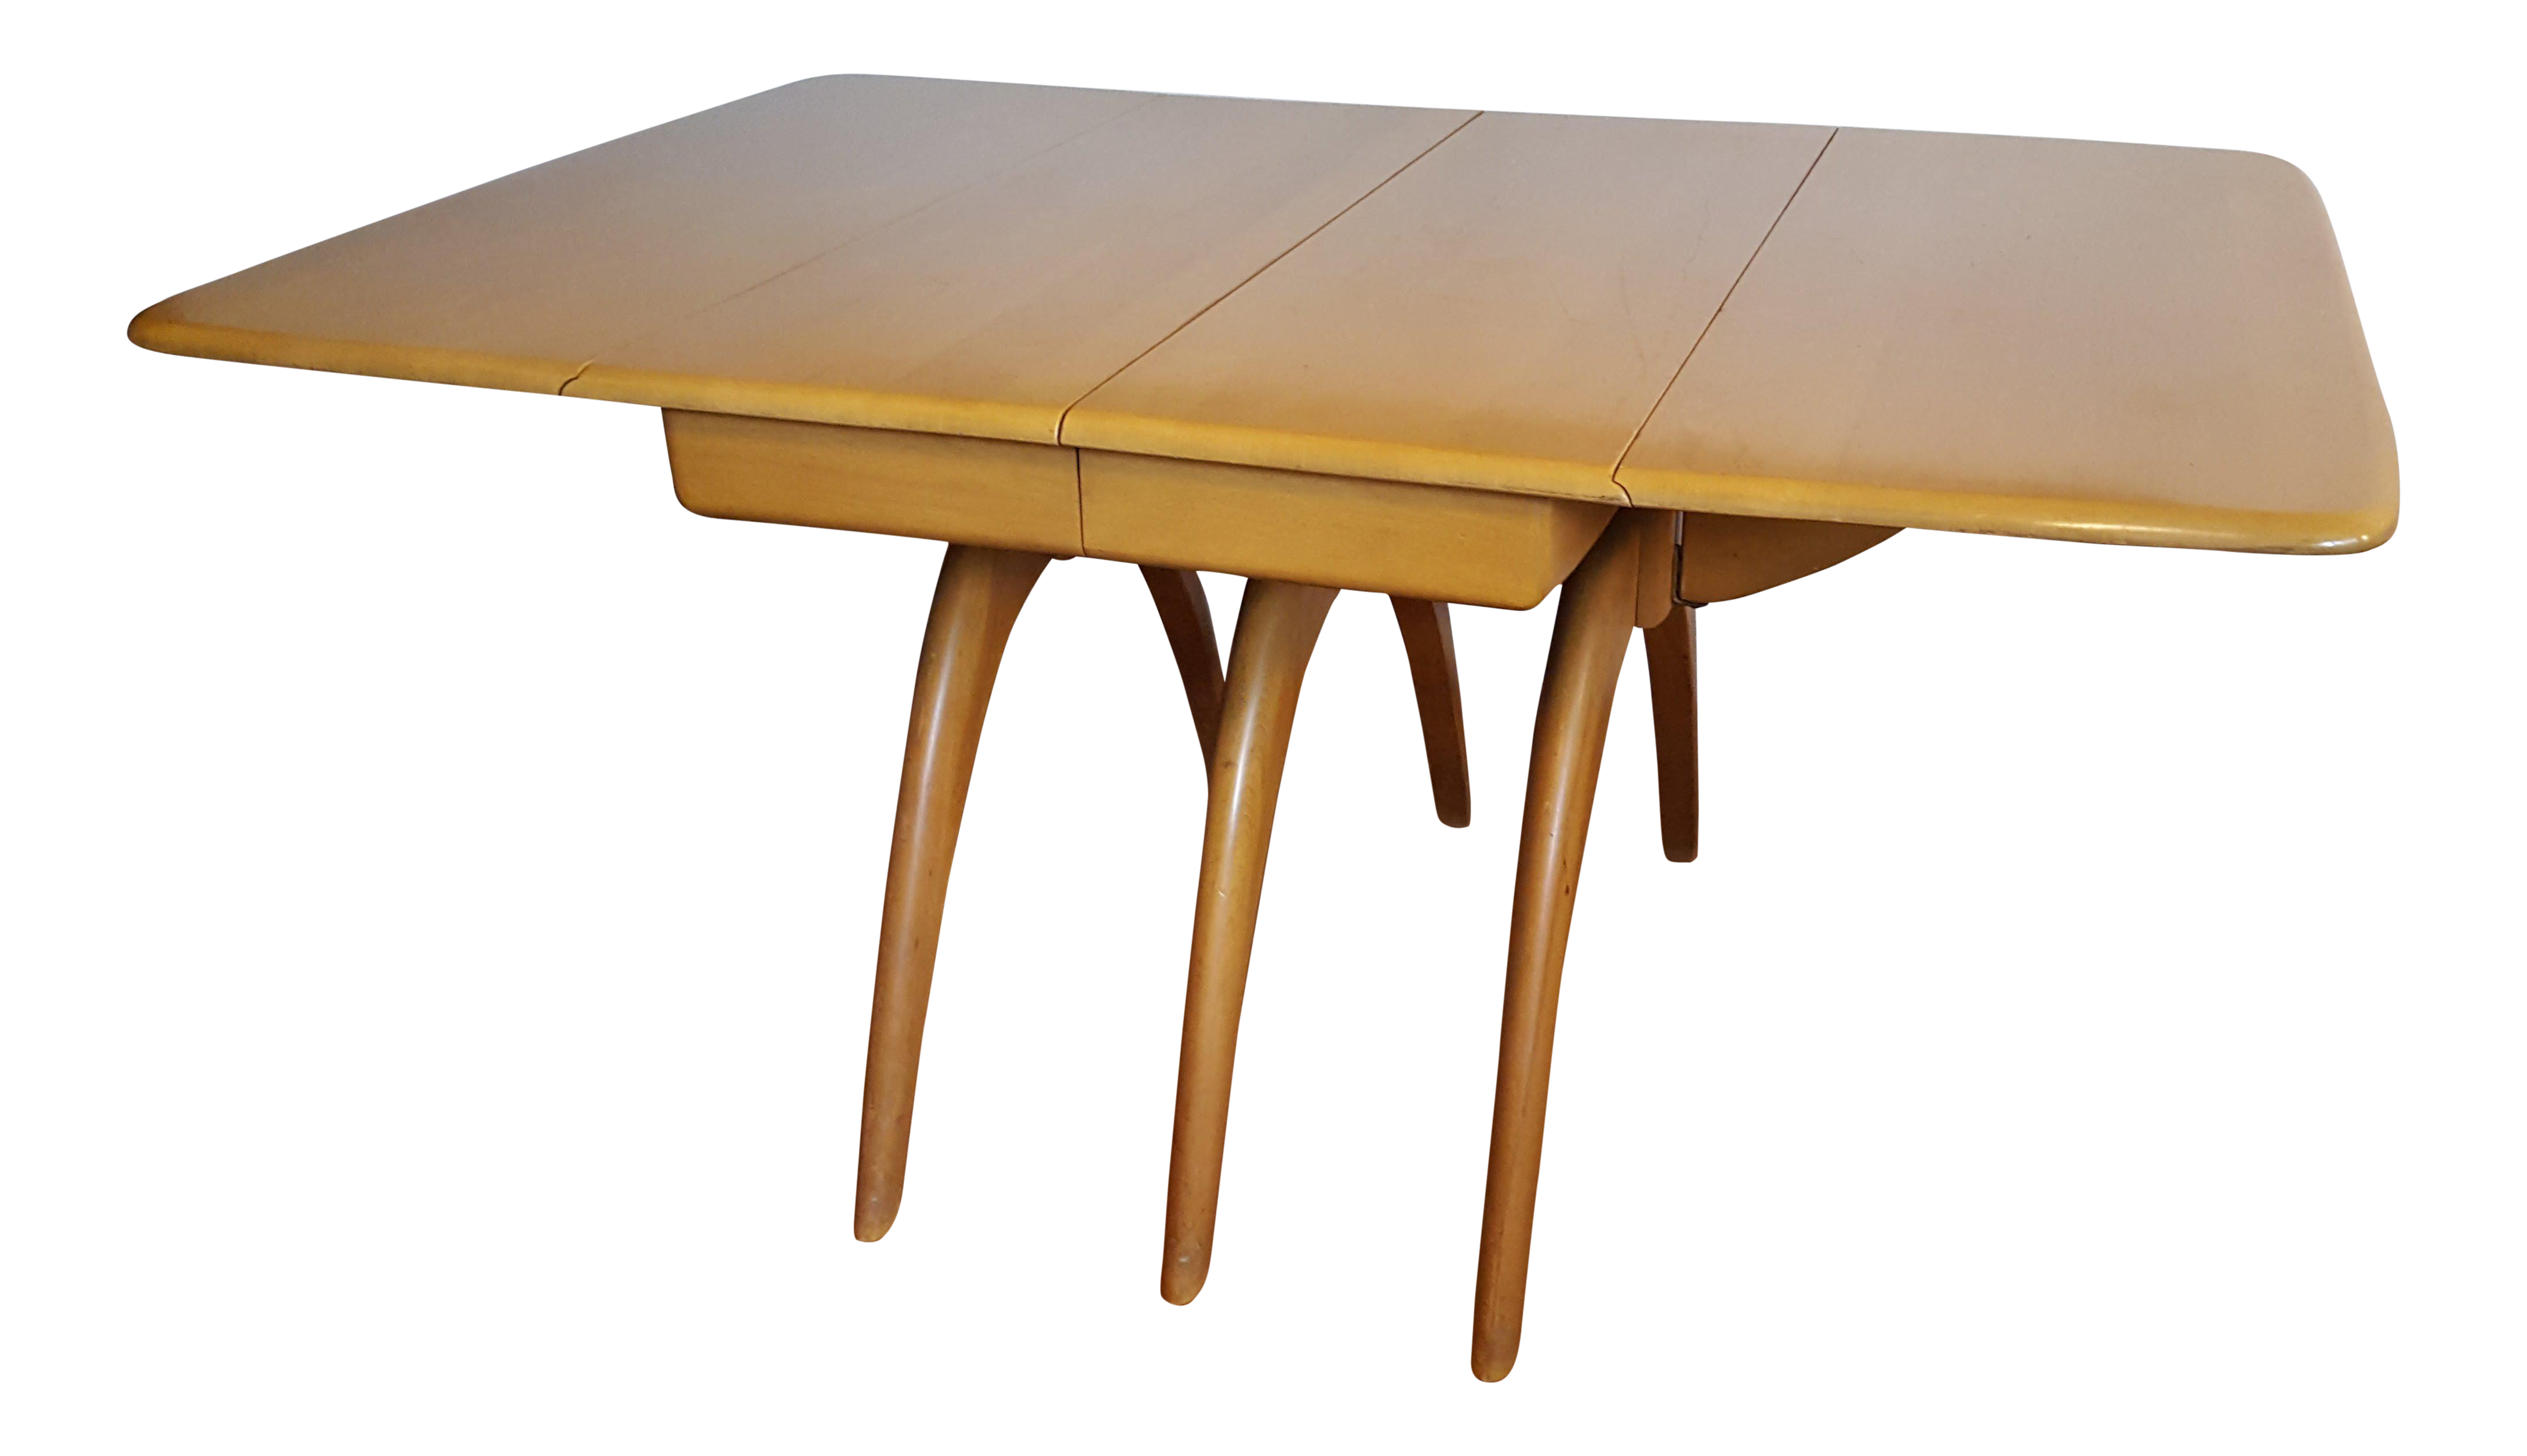 Genial 1950s Mid Century Modern Heywood Wakefield Wishbone Triple Pedestal Table  Champagne Finish Drop Leaf Dining Table